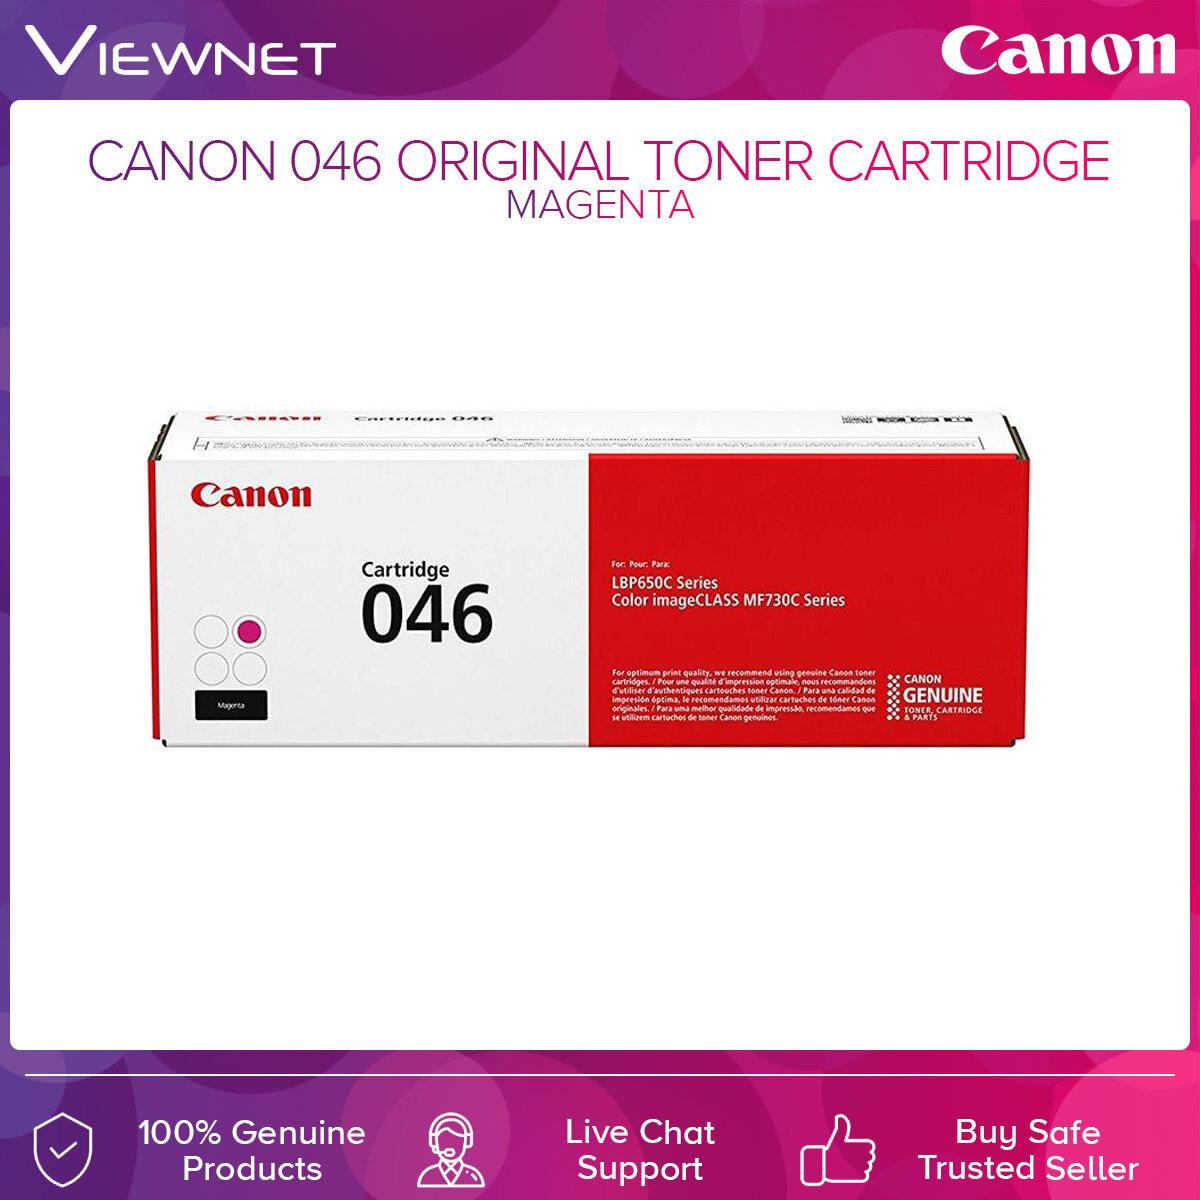 Canon 046 Original Toner Cartridge Black  Cyan  Magenta  Yellow